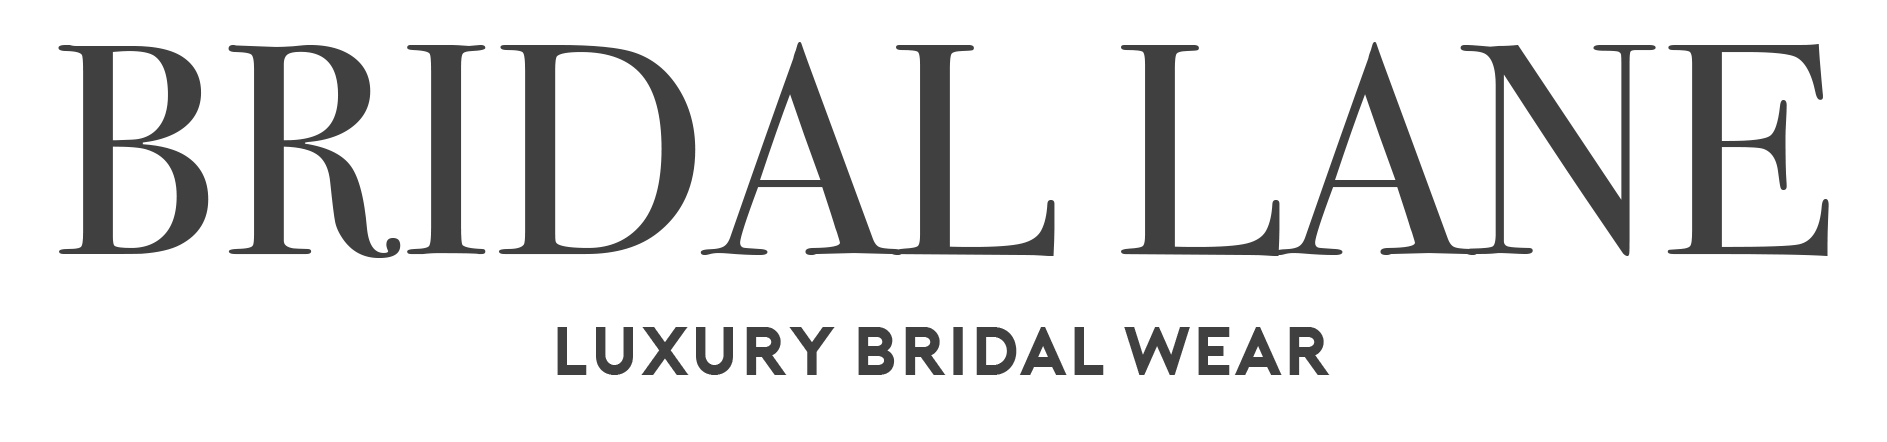 Bridal Lane